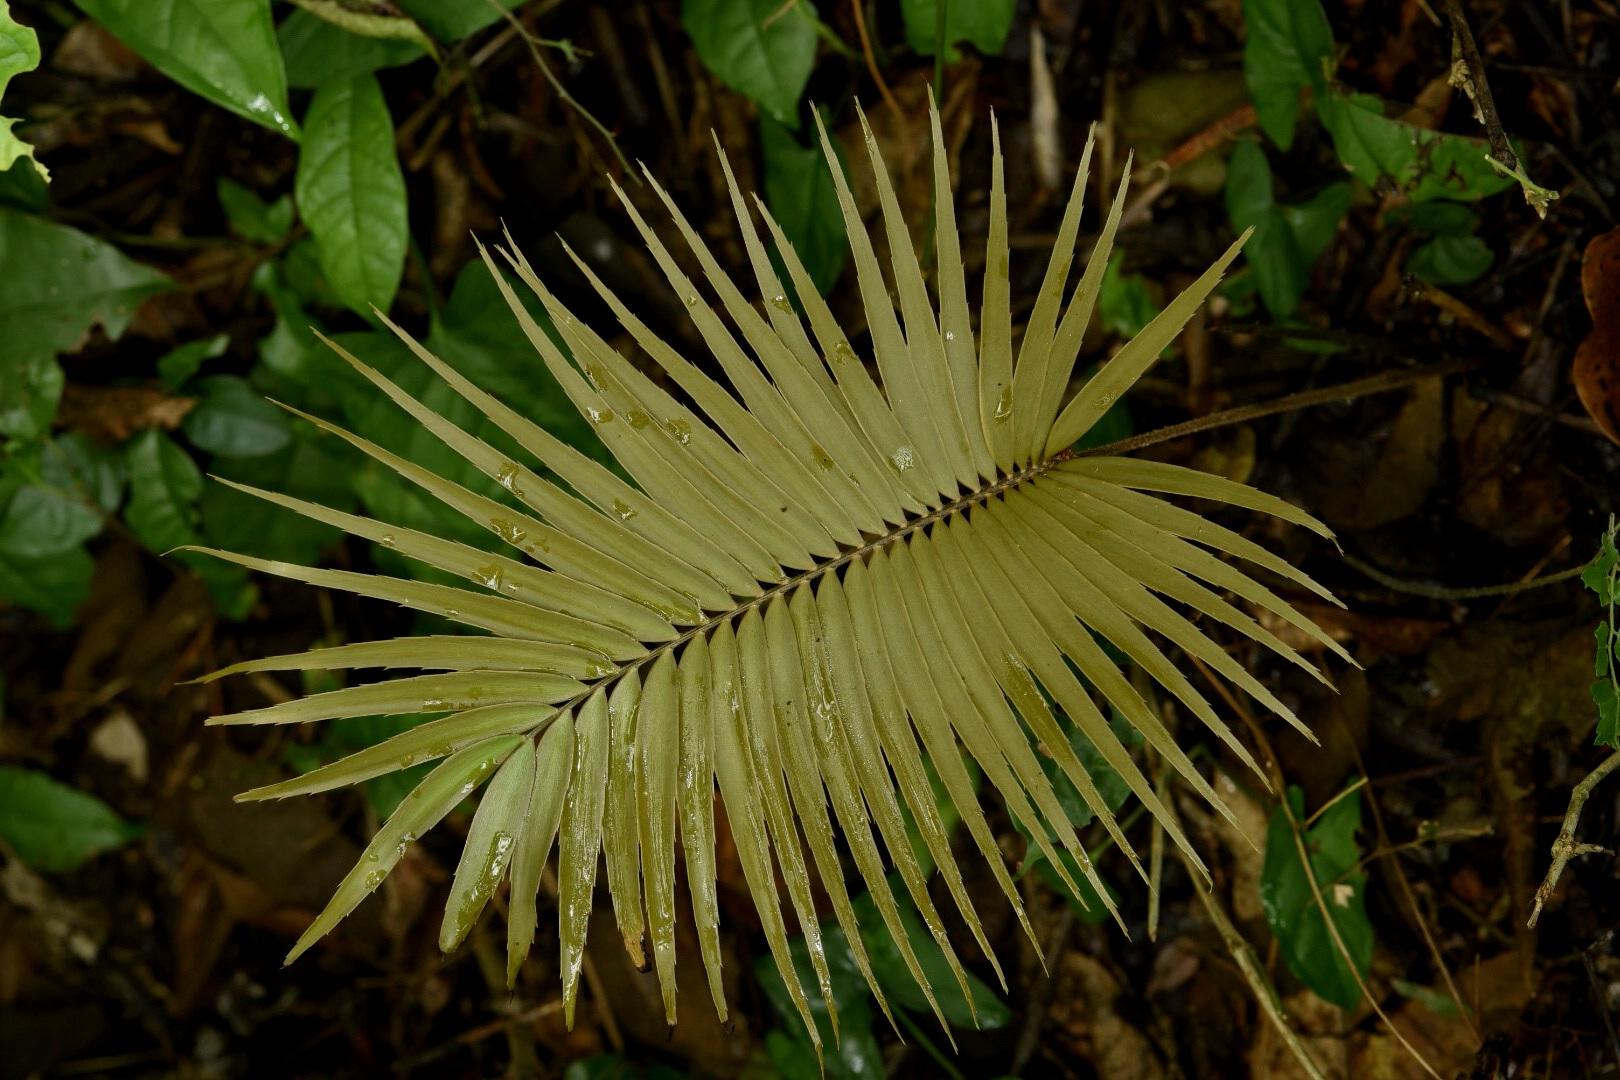 A newly-emerged leaf of  Zamia oreillyi  in habitat, northern Honduran lowlands. Image: F. Muller.